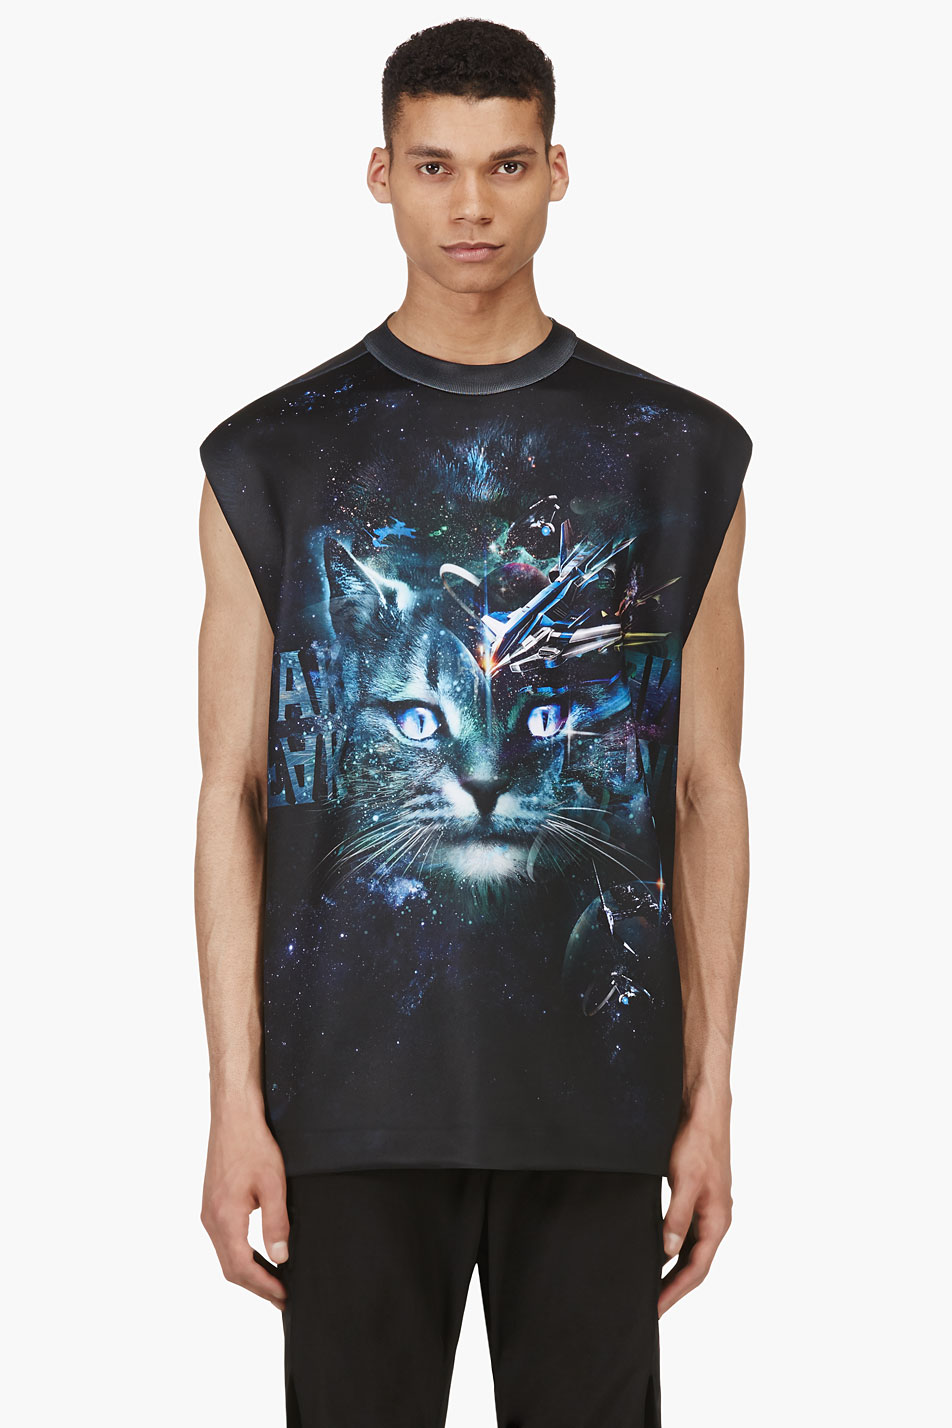 Juun.j ssense exclusive black and green cosmic cat muscle shirt